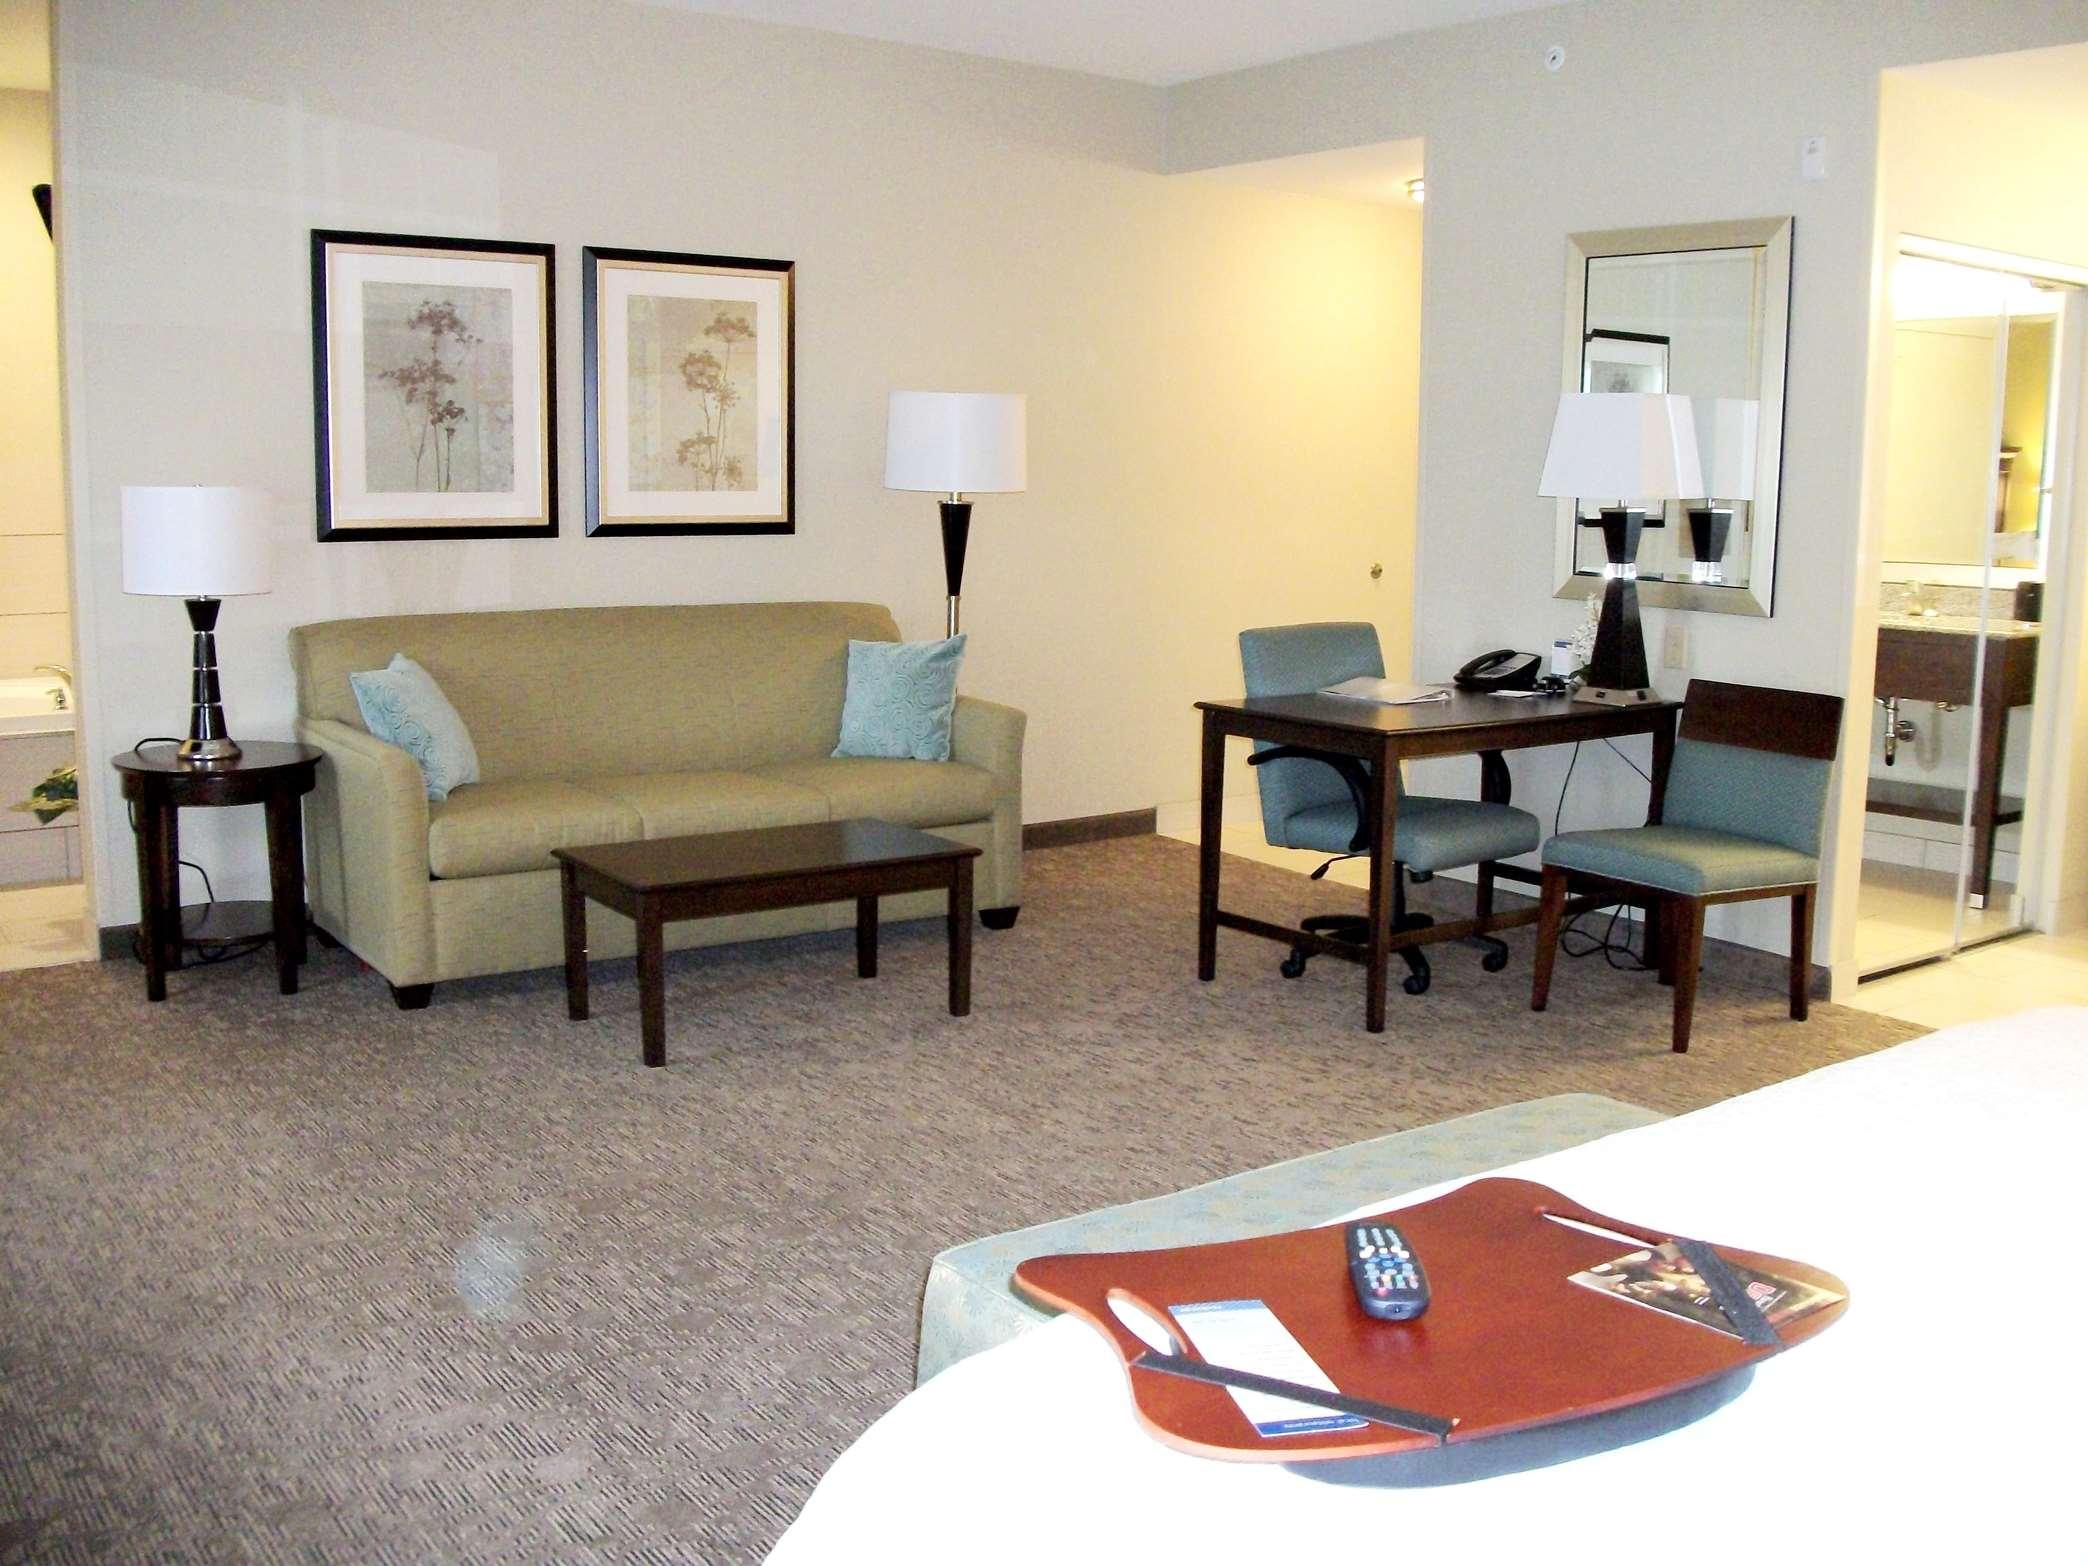 Hampton Inn & Suites Manteca image 26